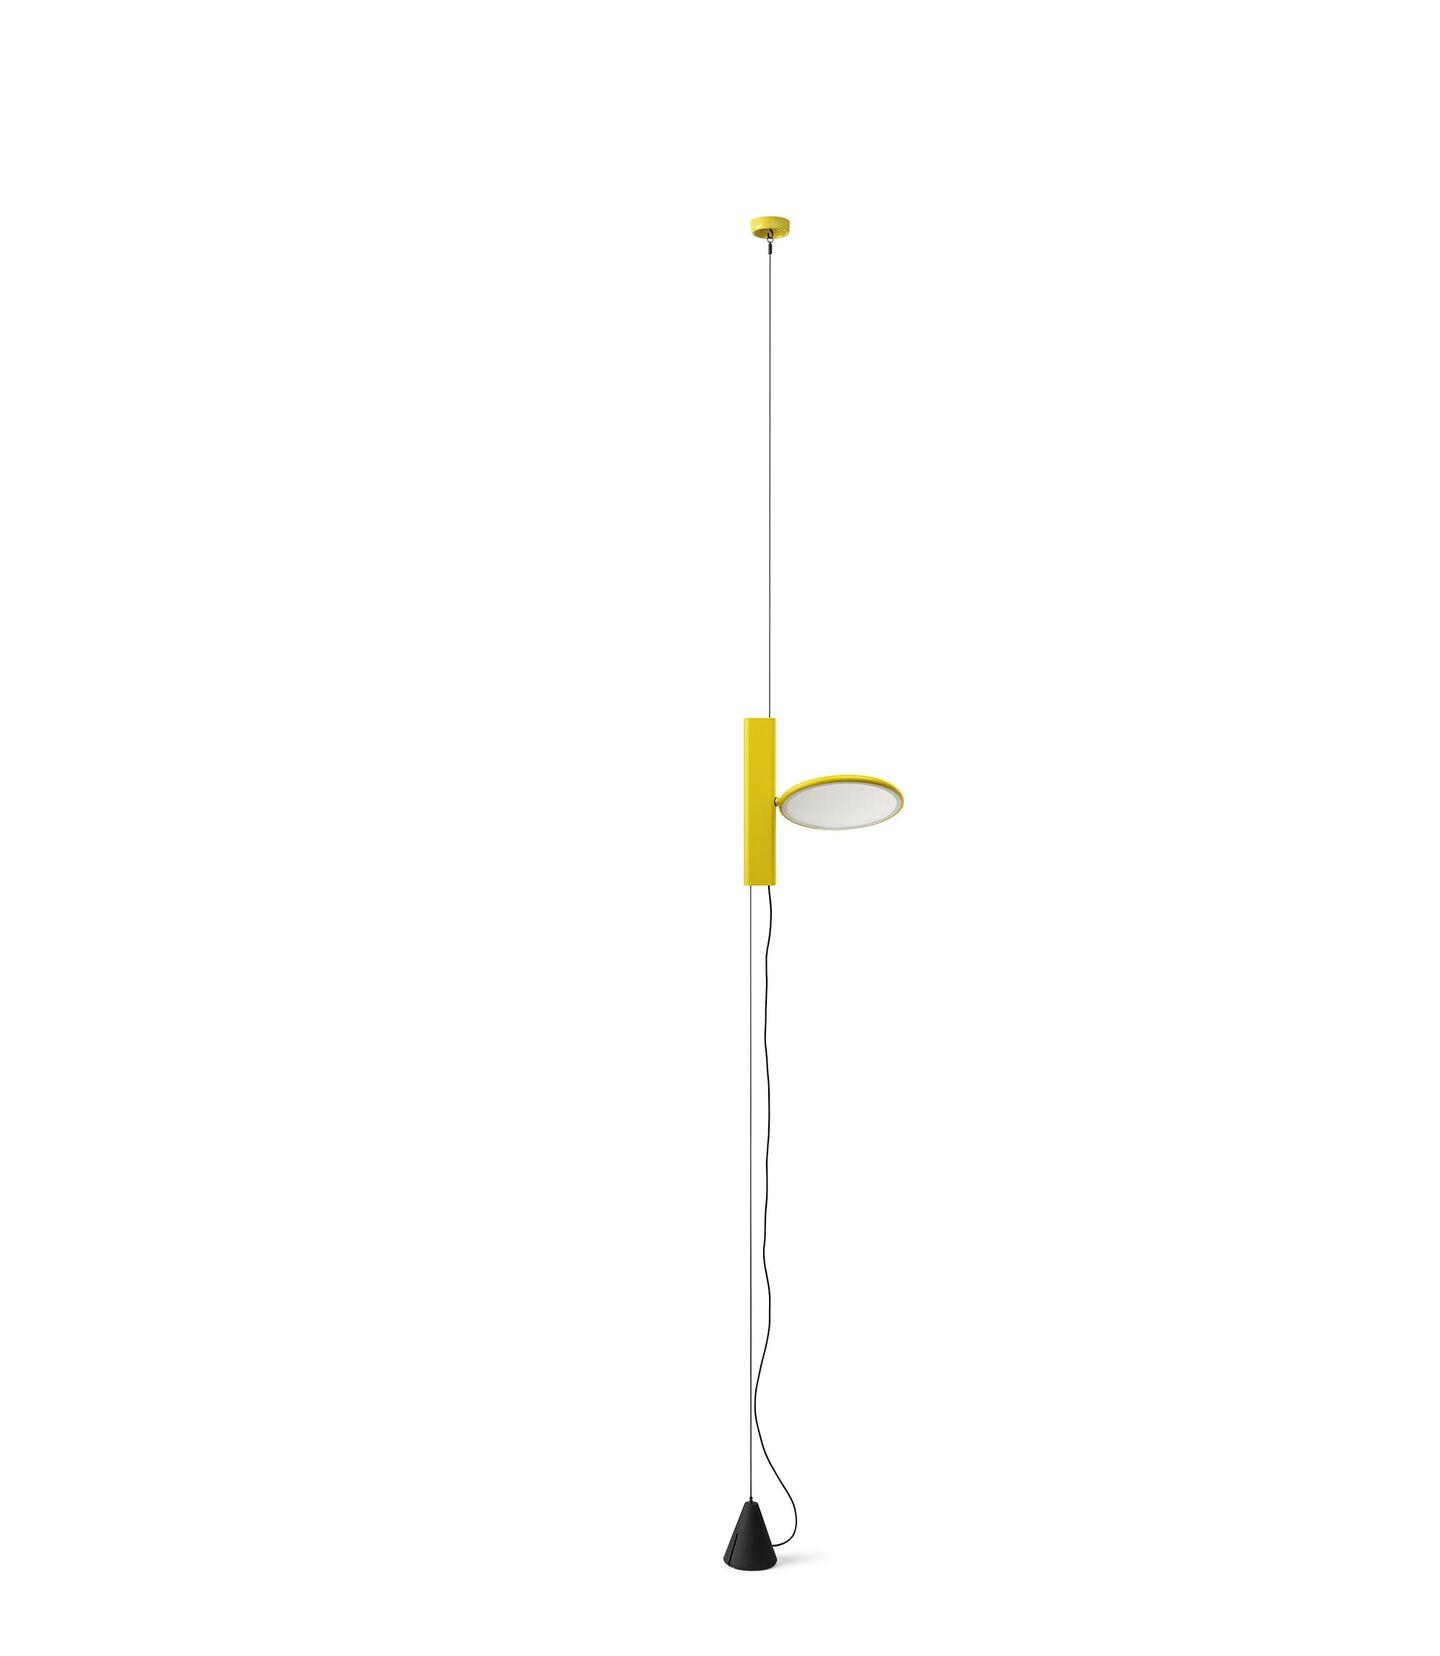 ok-suspension-grcic-flos-F4640019-product-still-life-big